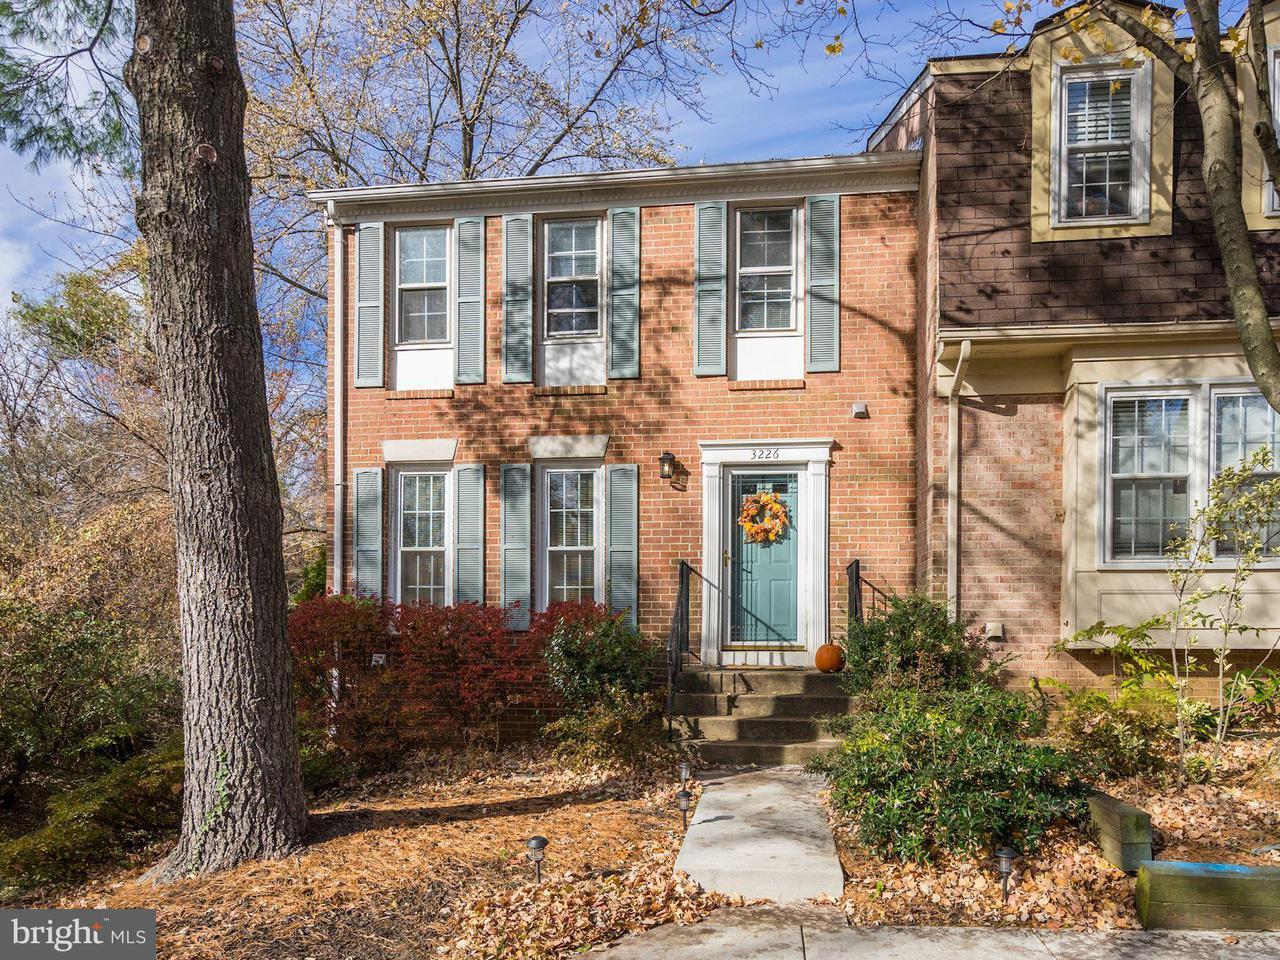 Townhouse for Sale at 3226 WHITE FLINT Court 3226 WHITE FLINT Court Oakton, Virginia 22124 United States